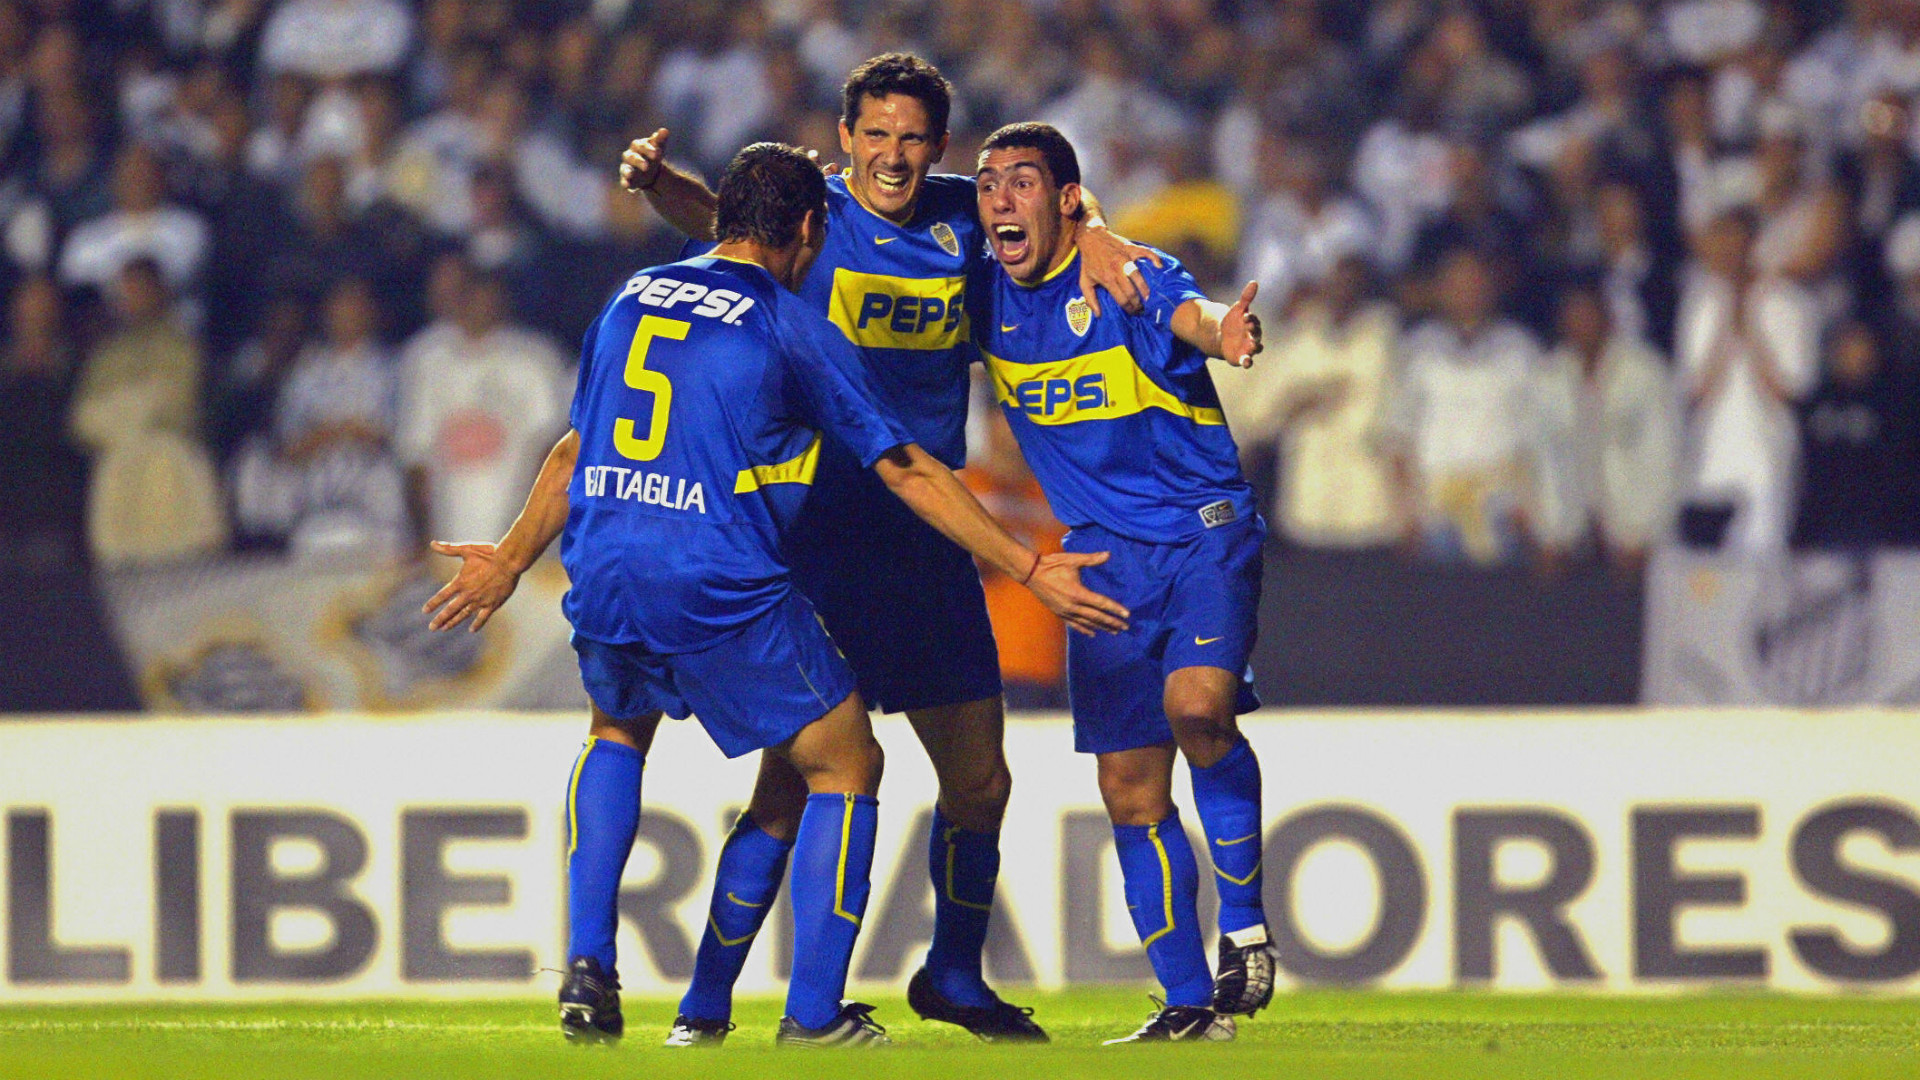 Carlos Tevez Diego Cagna Sebastian Battaglia Boca Santos Final Copa Libertadores 2003